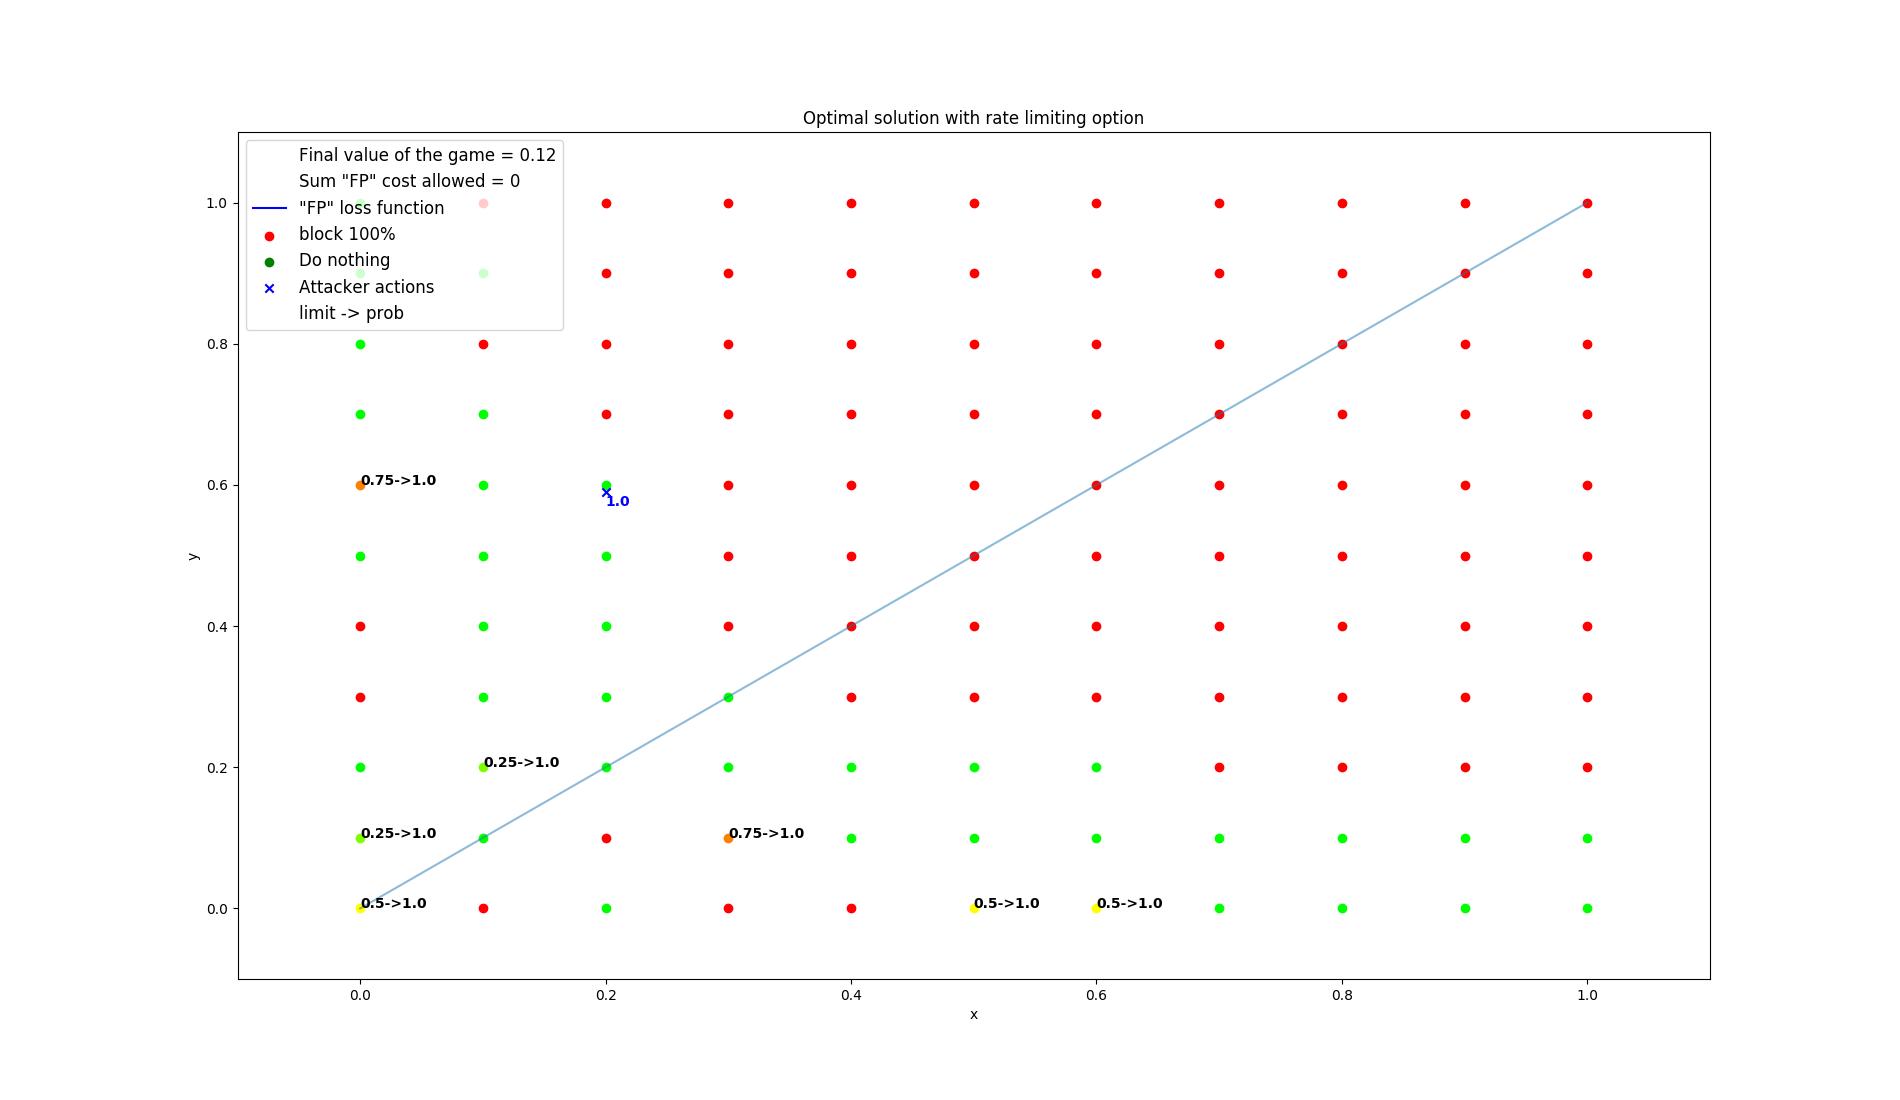 results/optimal/false_positive_constraint/1-summarization.png